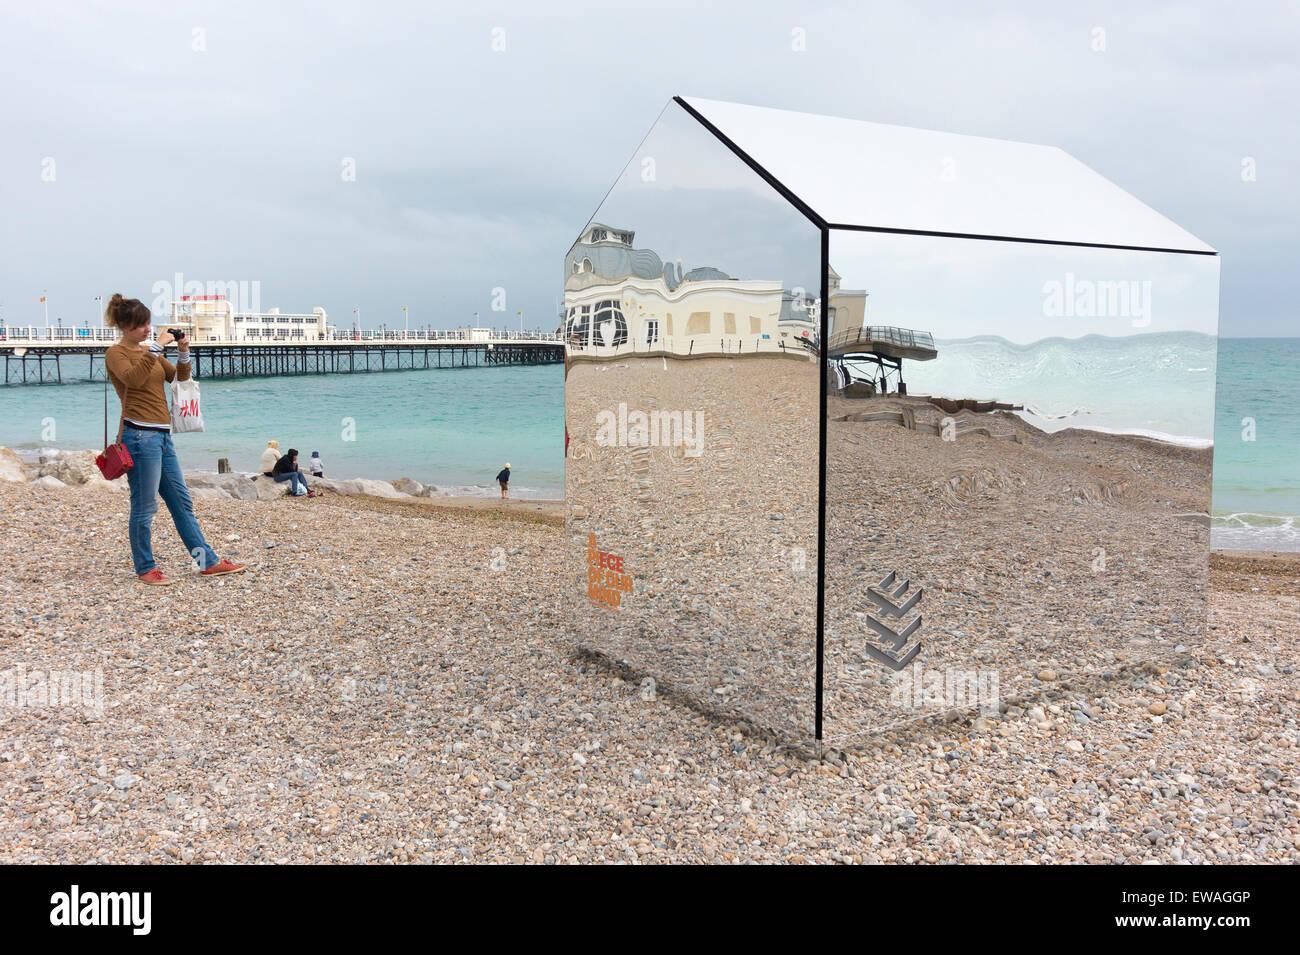 Mirrored Beach Hut Art Installation By Ece Architects On